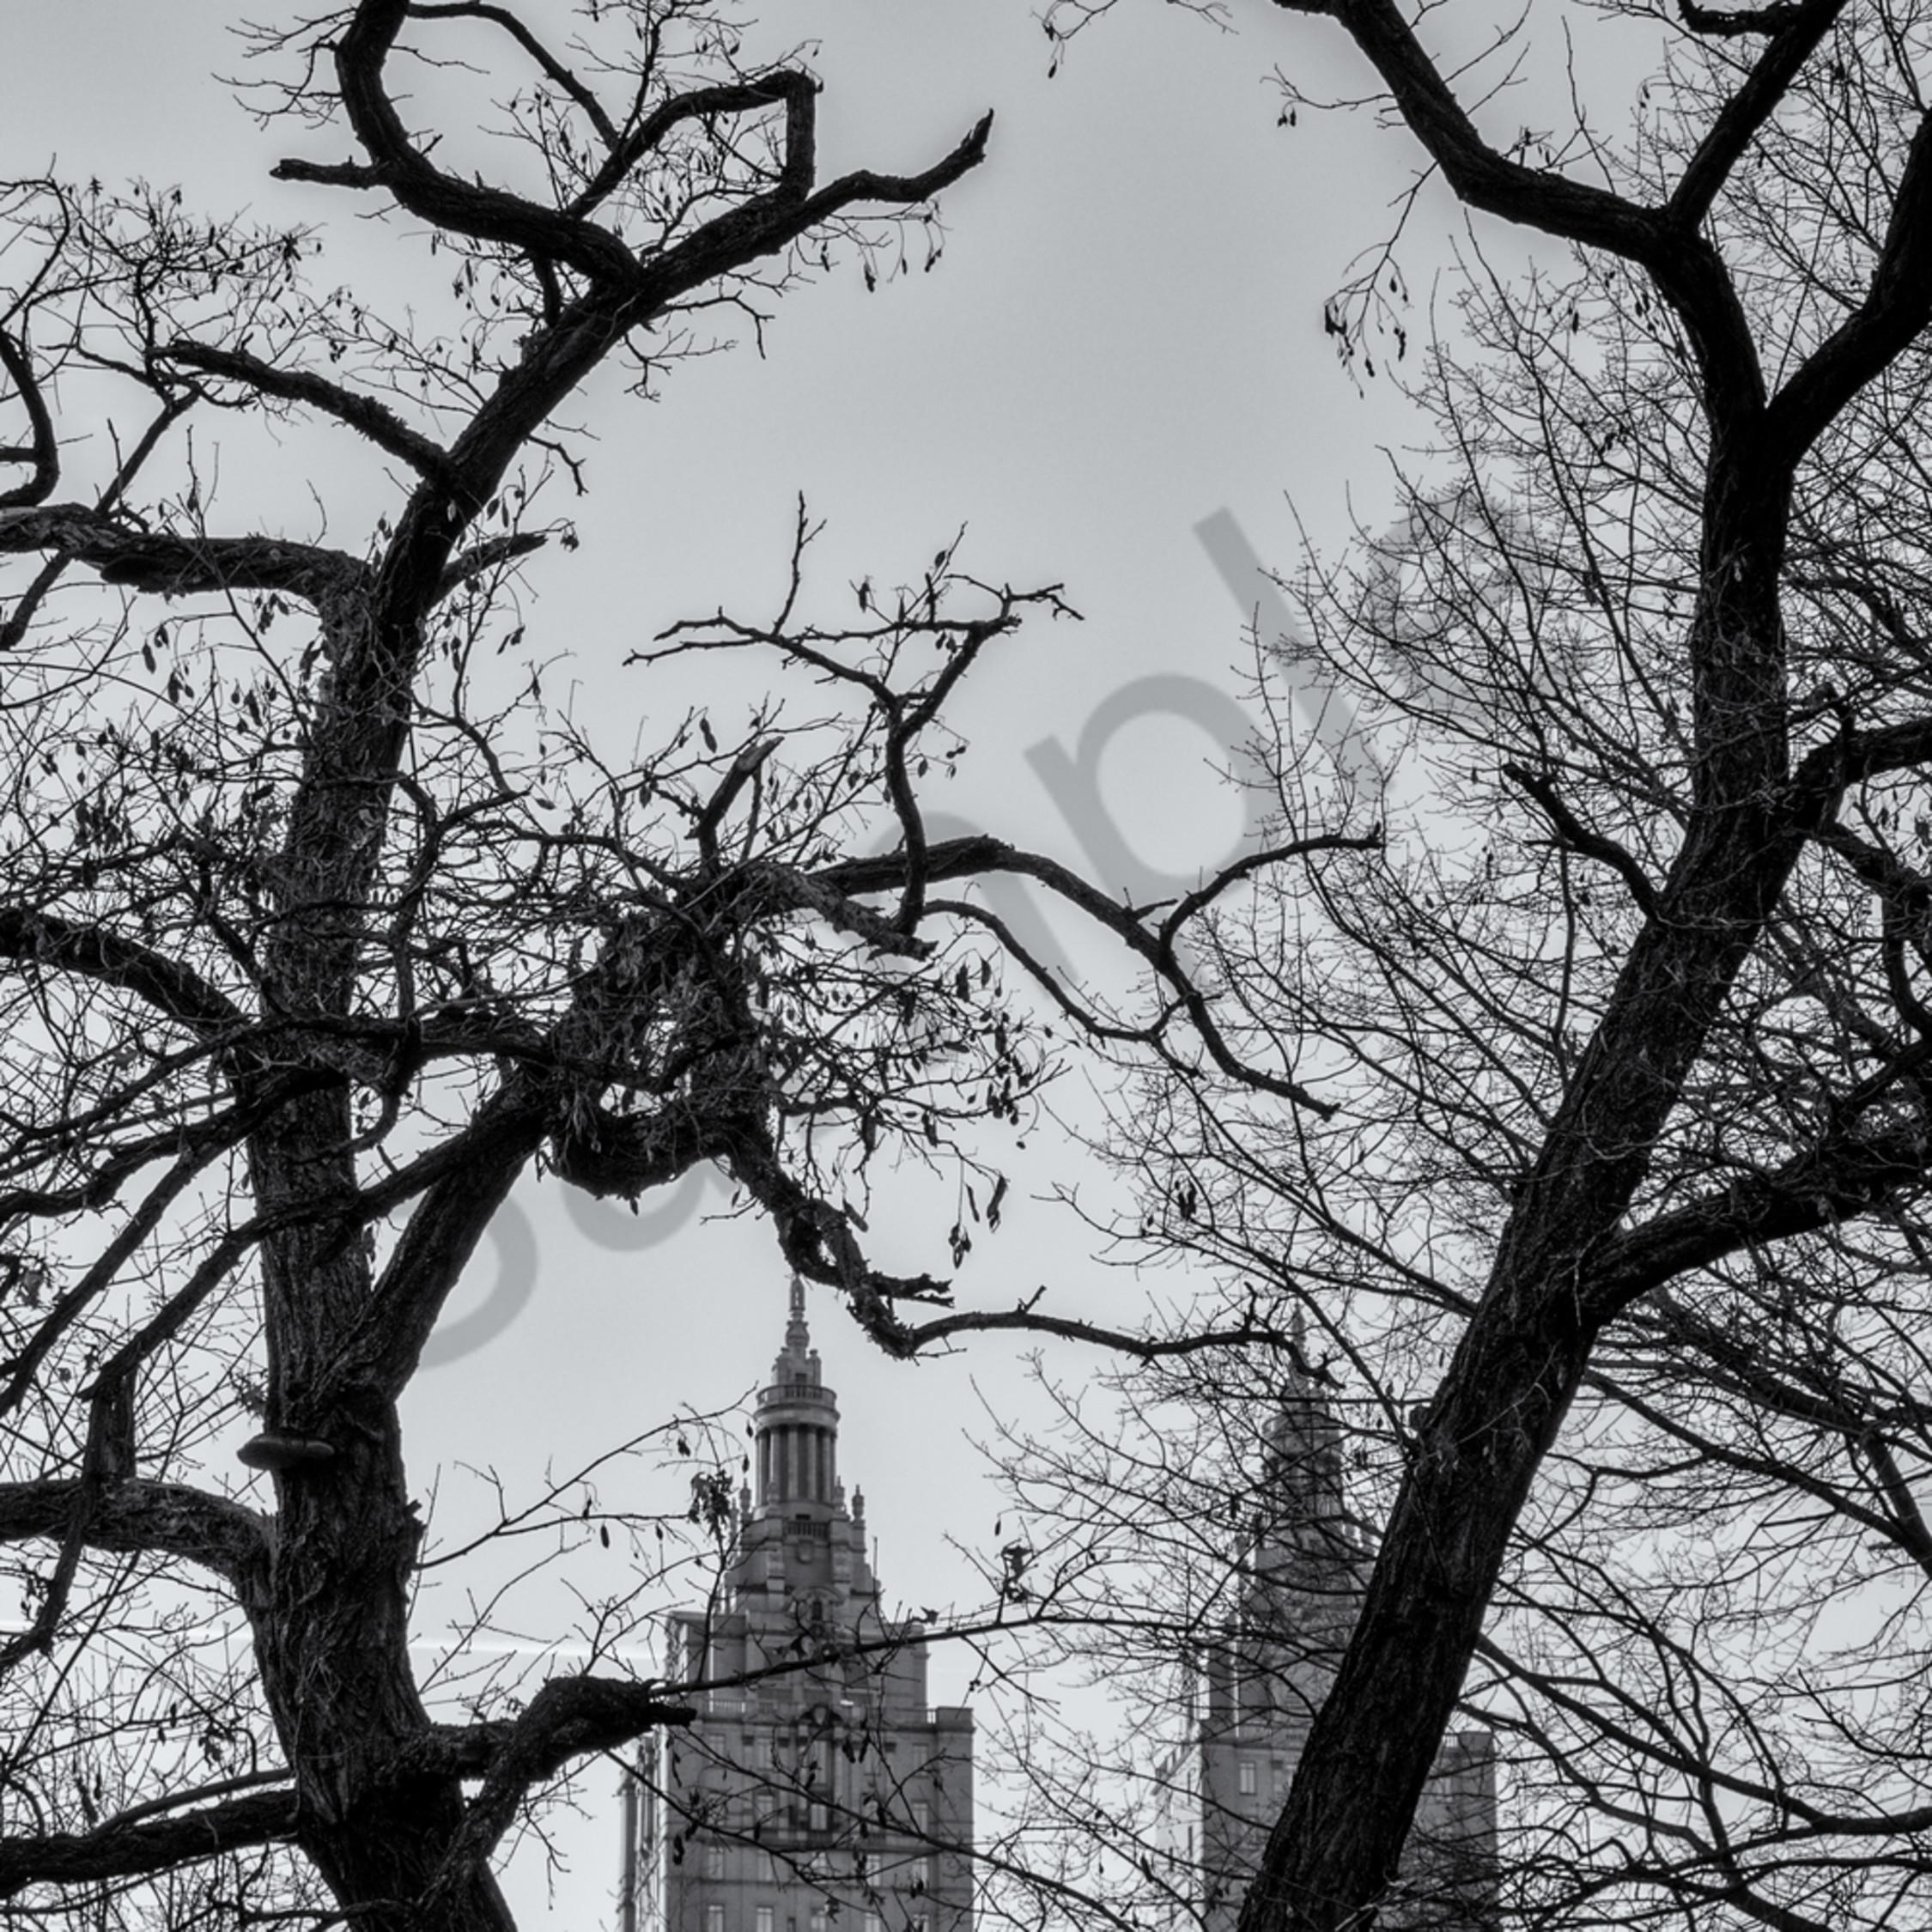 Central park nyc pltu2q